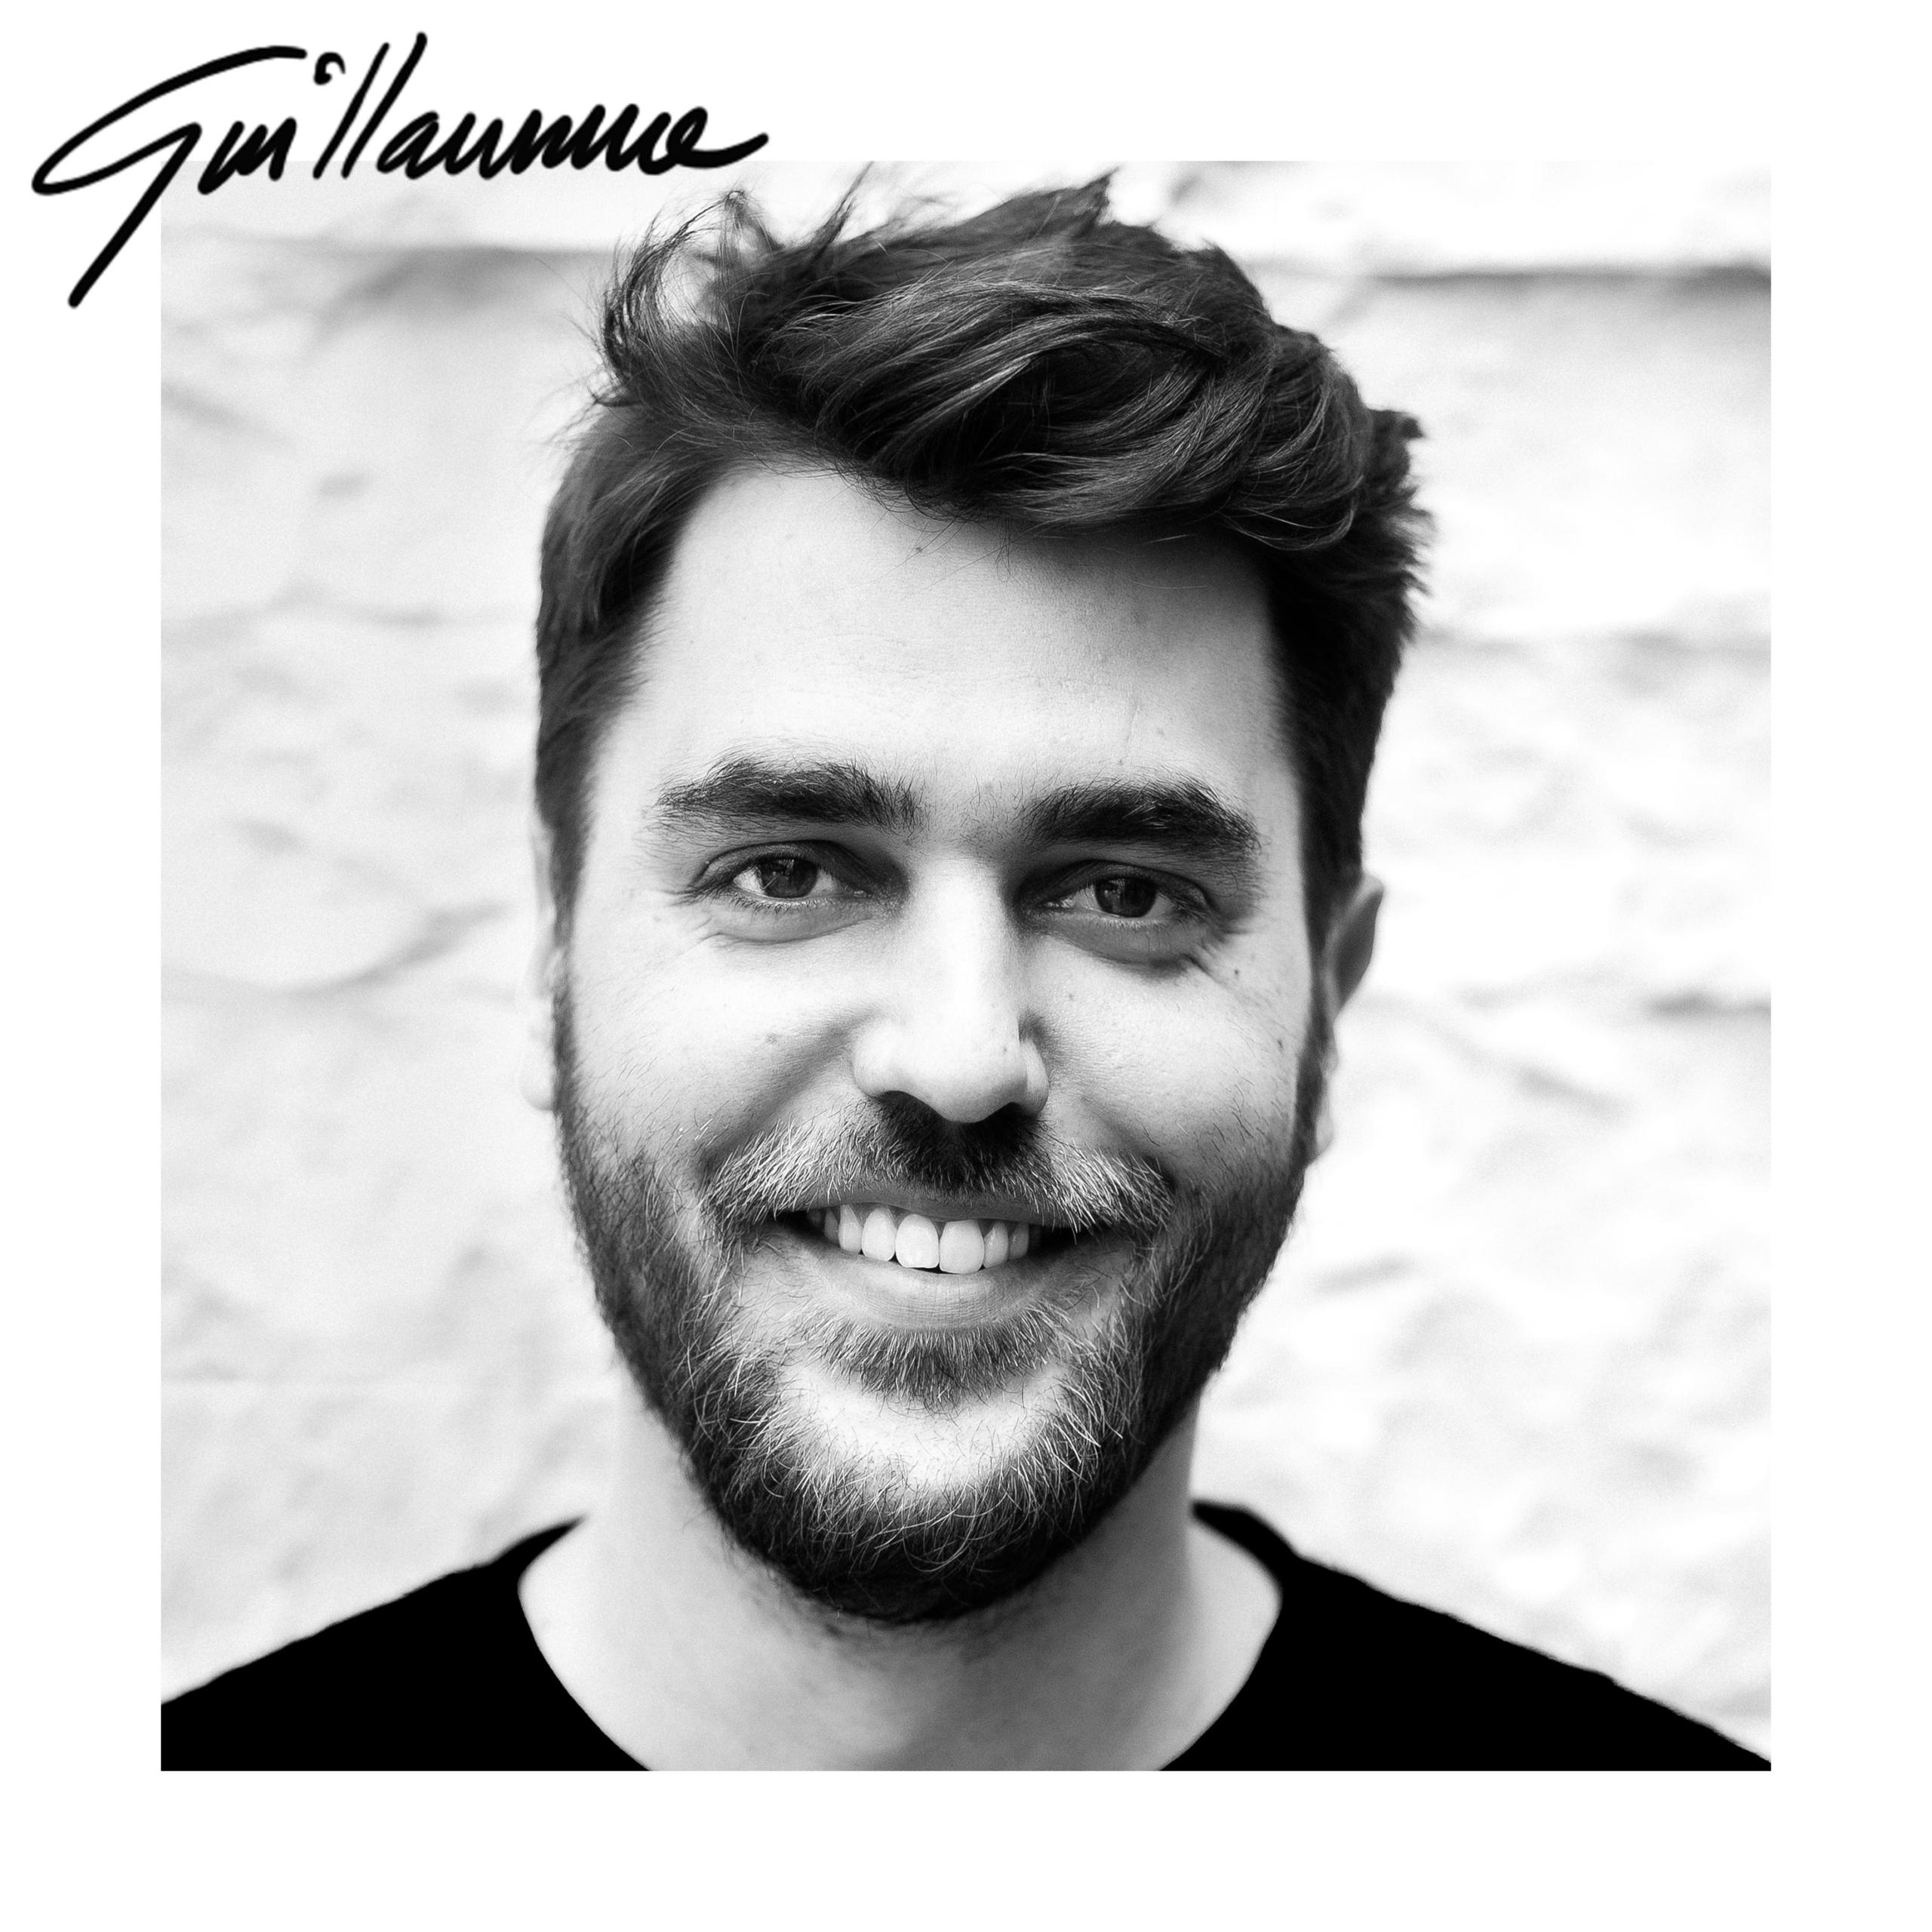 Guillaume Van Moerkercke